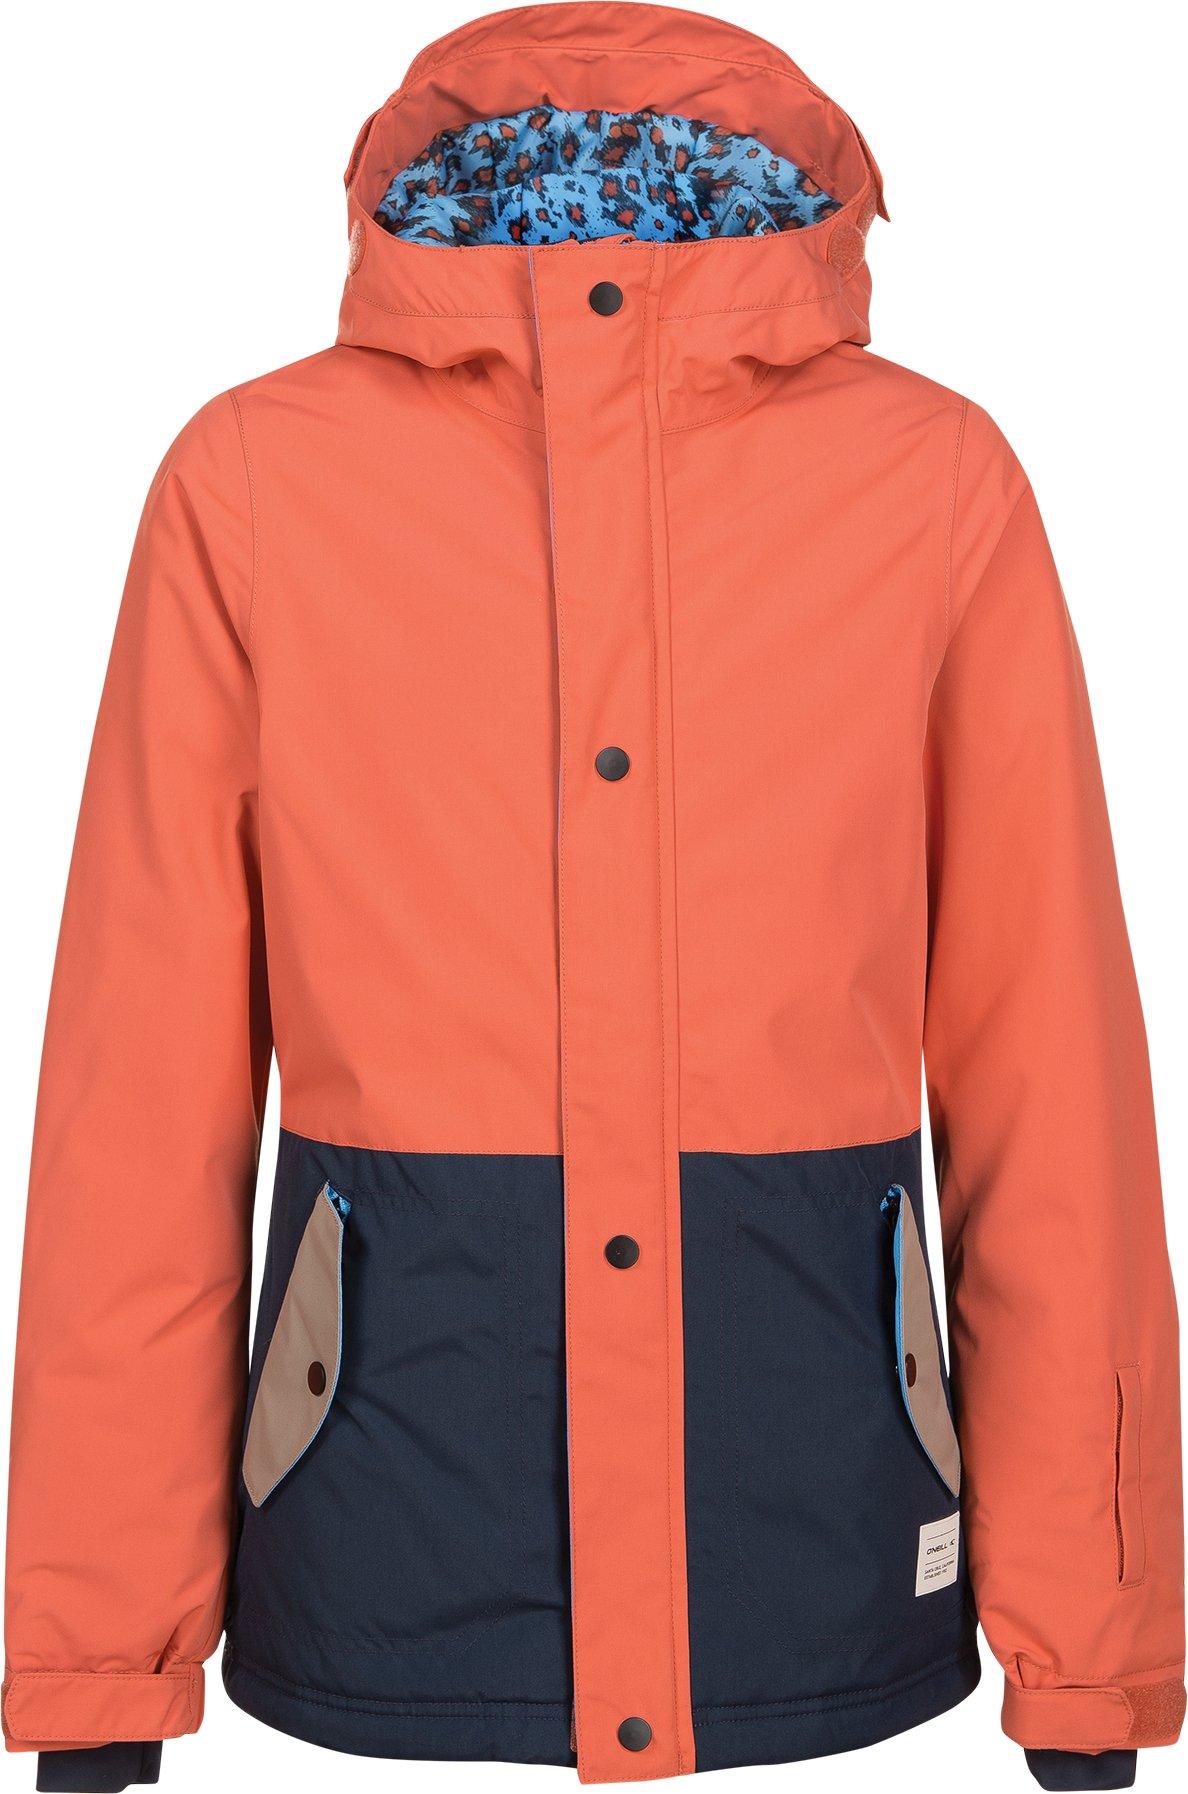 O'Neill Girls Flare Jacket, Burnt Sienna, Size 12